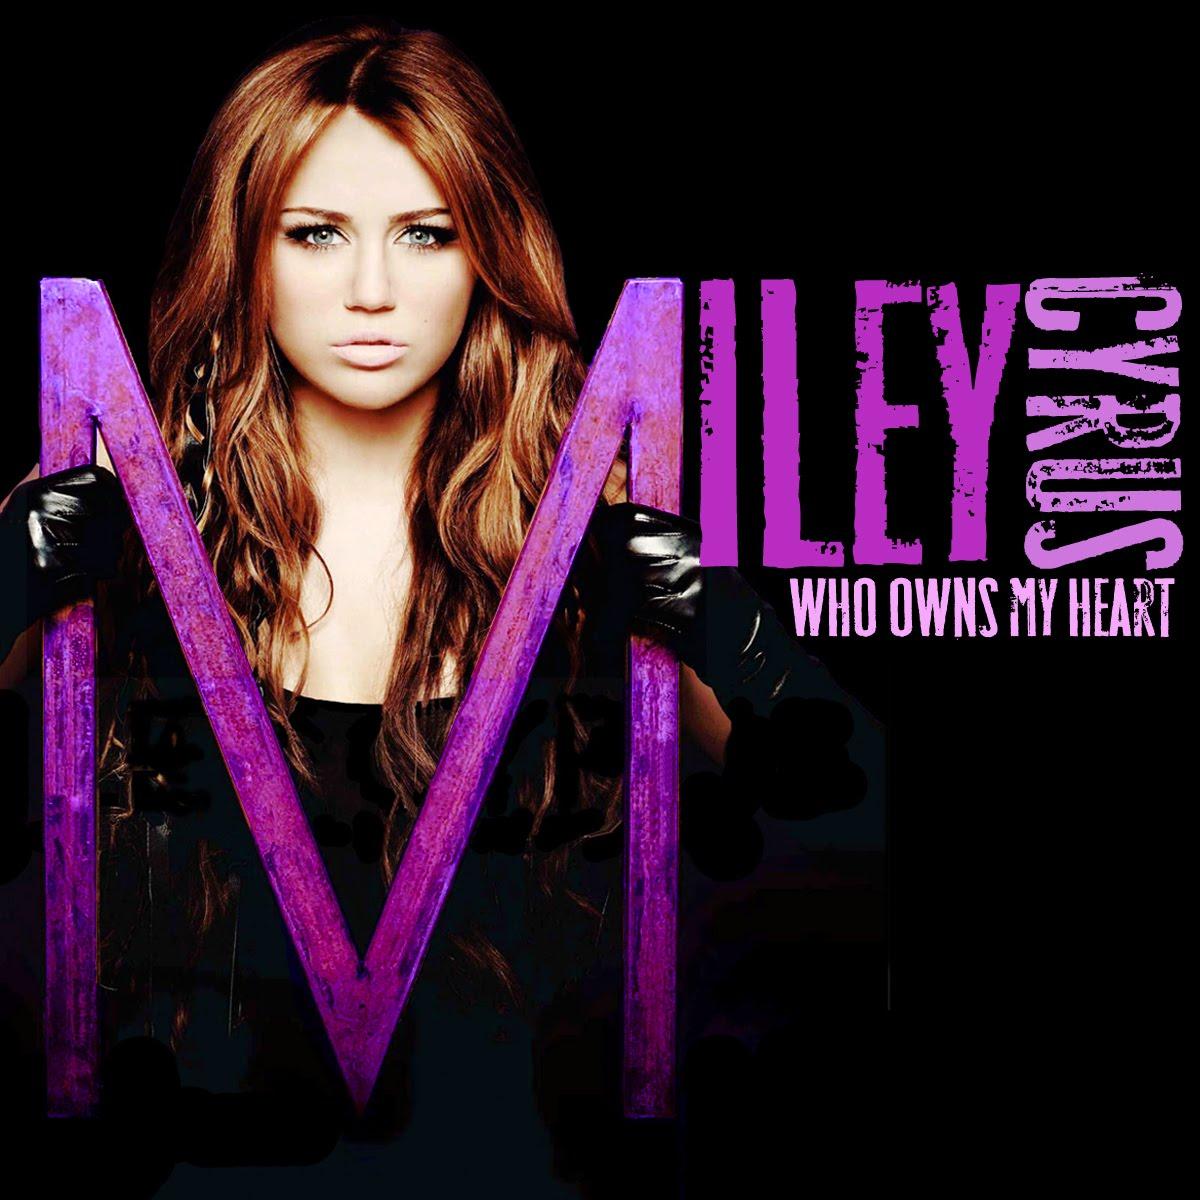 http://4.bp.blogspot.com/_RgT4uLka32g/THGCfkL6RfI/AAAAAAAAMck/ffnTubefiWE/s1600/oMiley-Cyrus-Who-Owns-My-Heart-FanMade.jpg